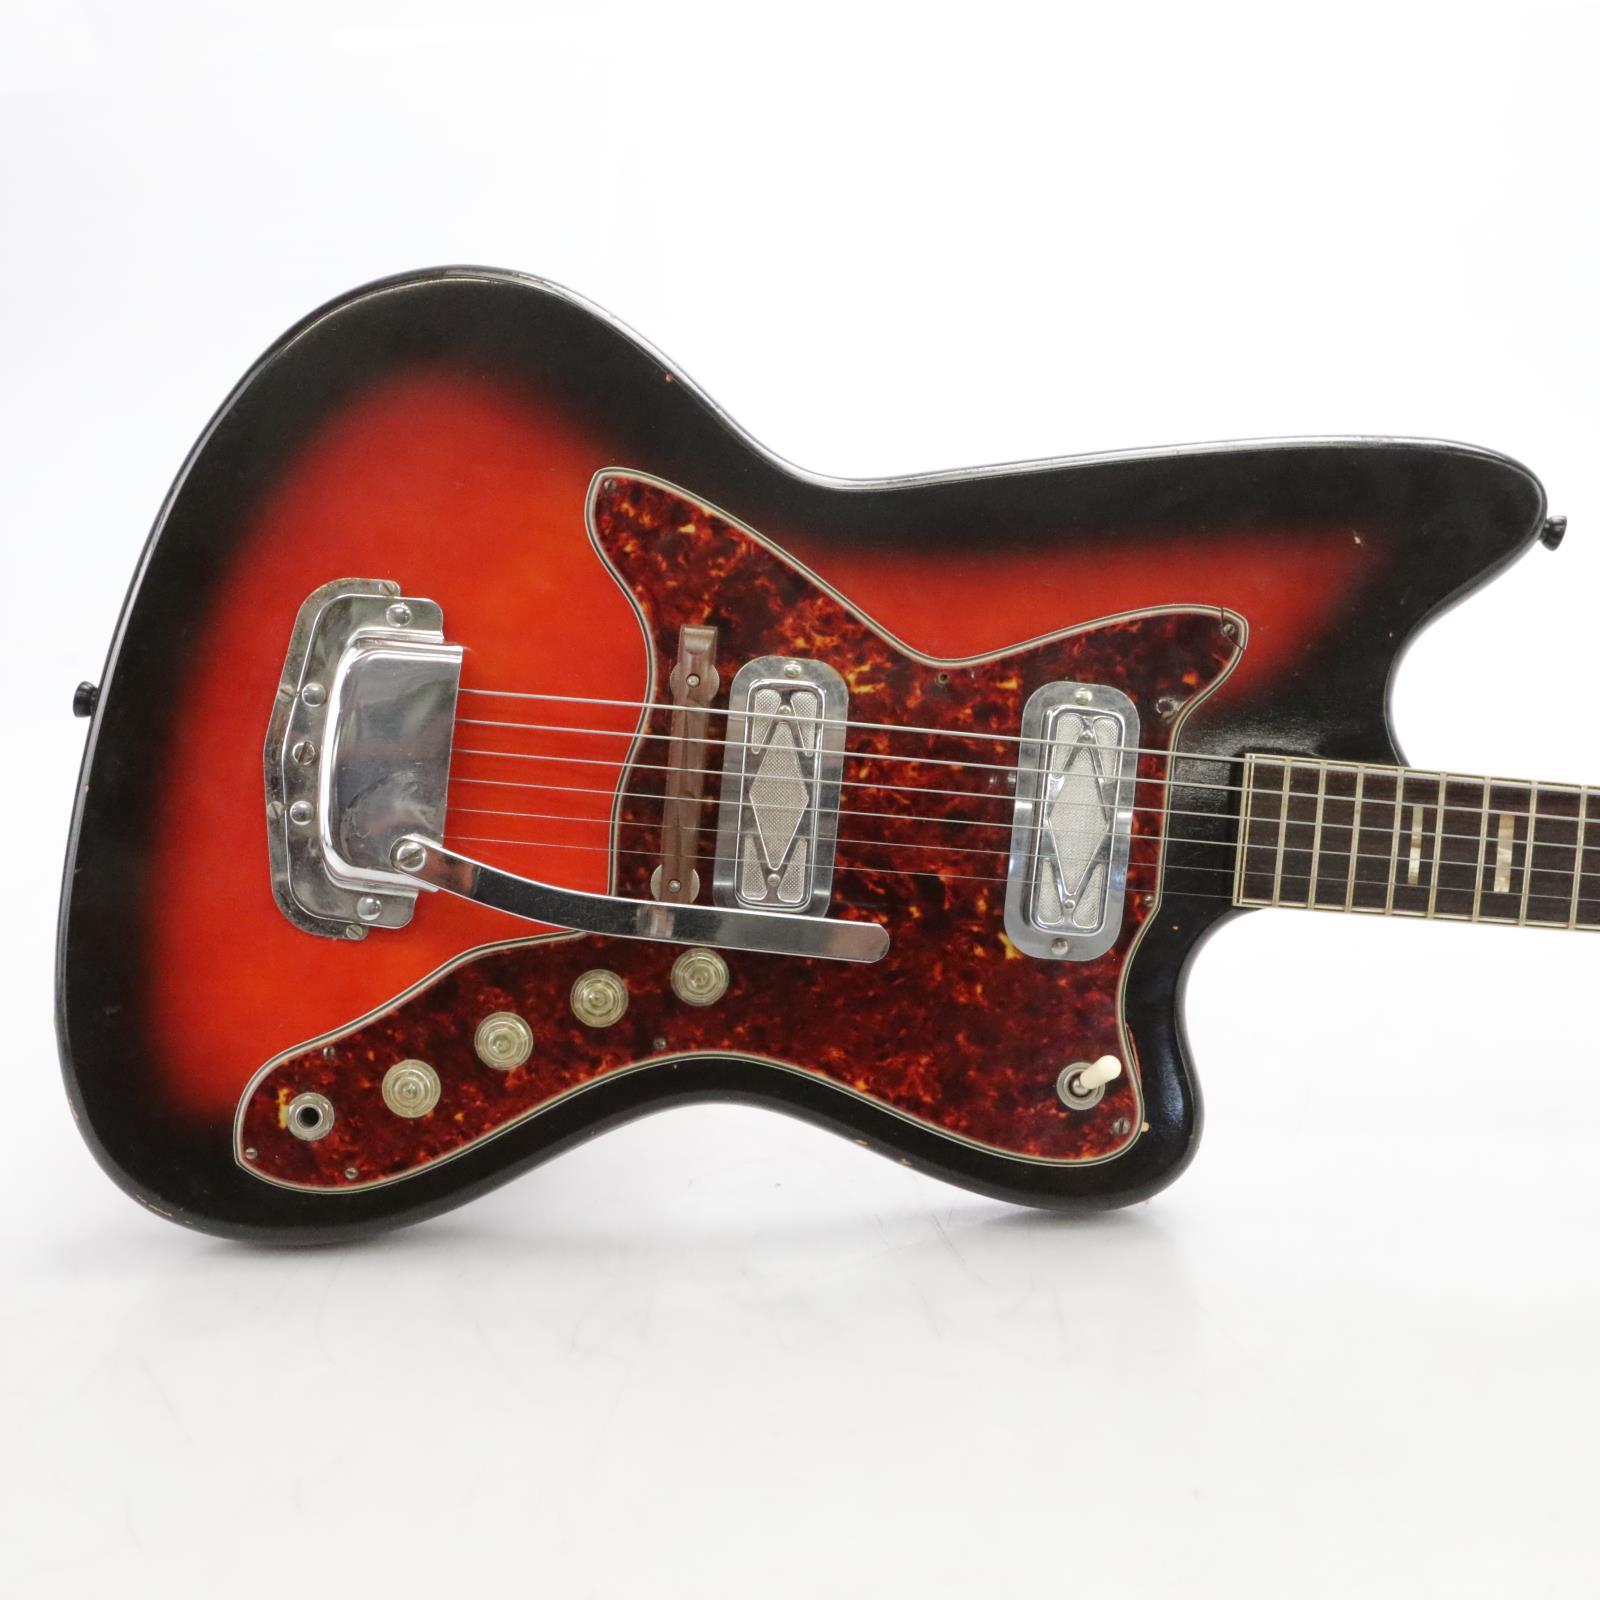 Vintage Silvertone Silhouette 1478 Electric Guitar w/ Case #44423